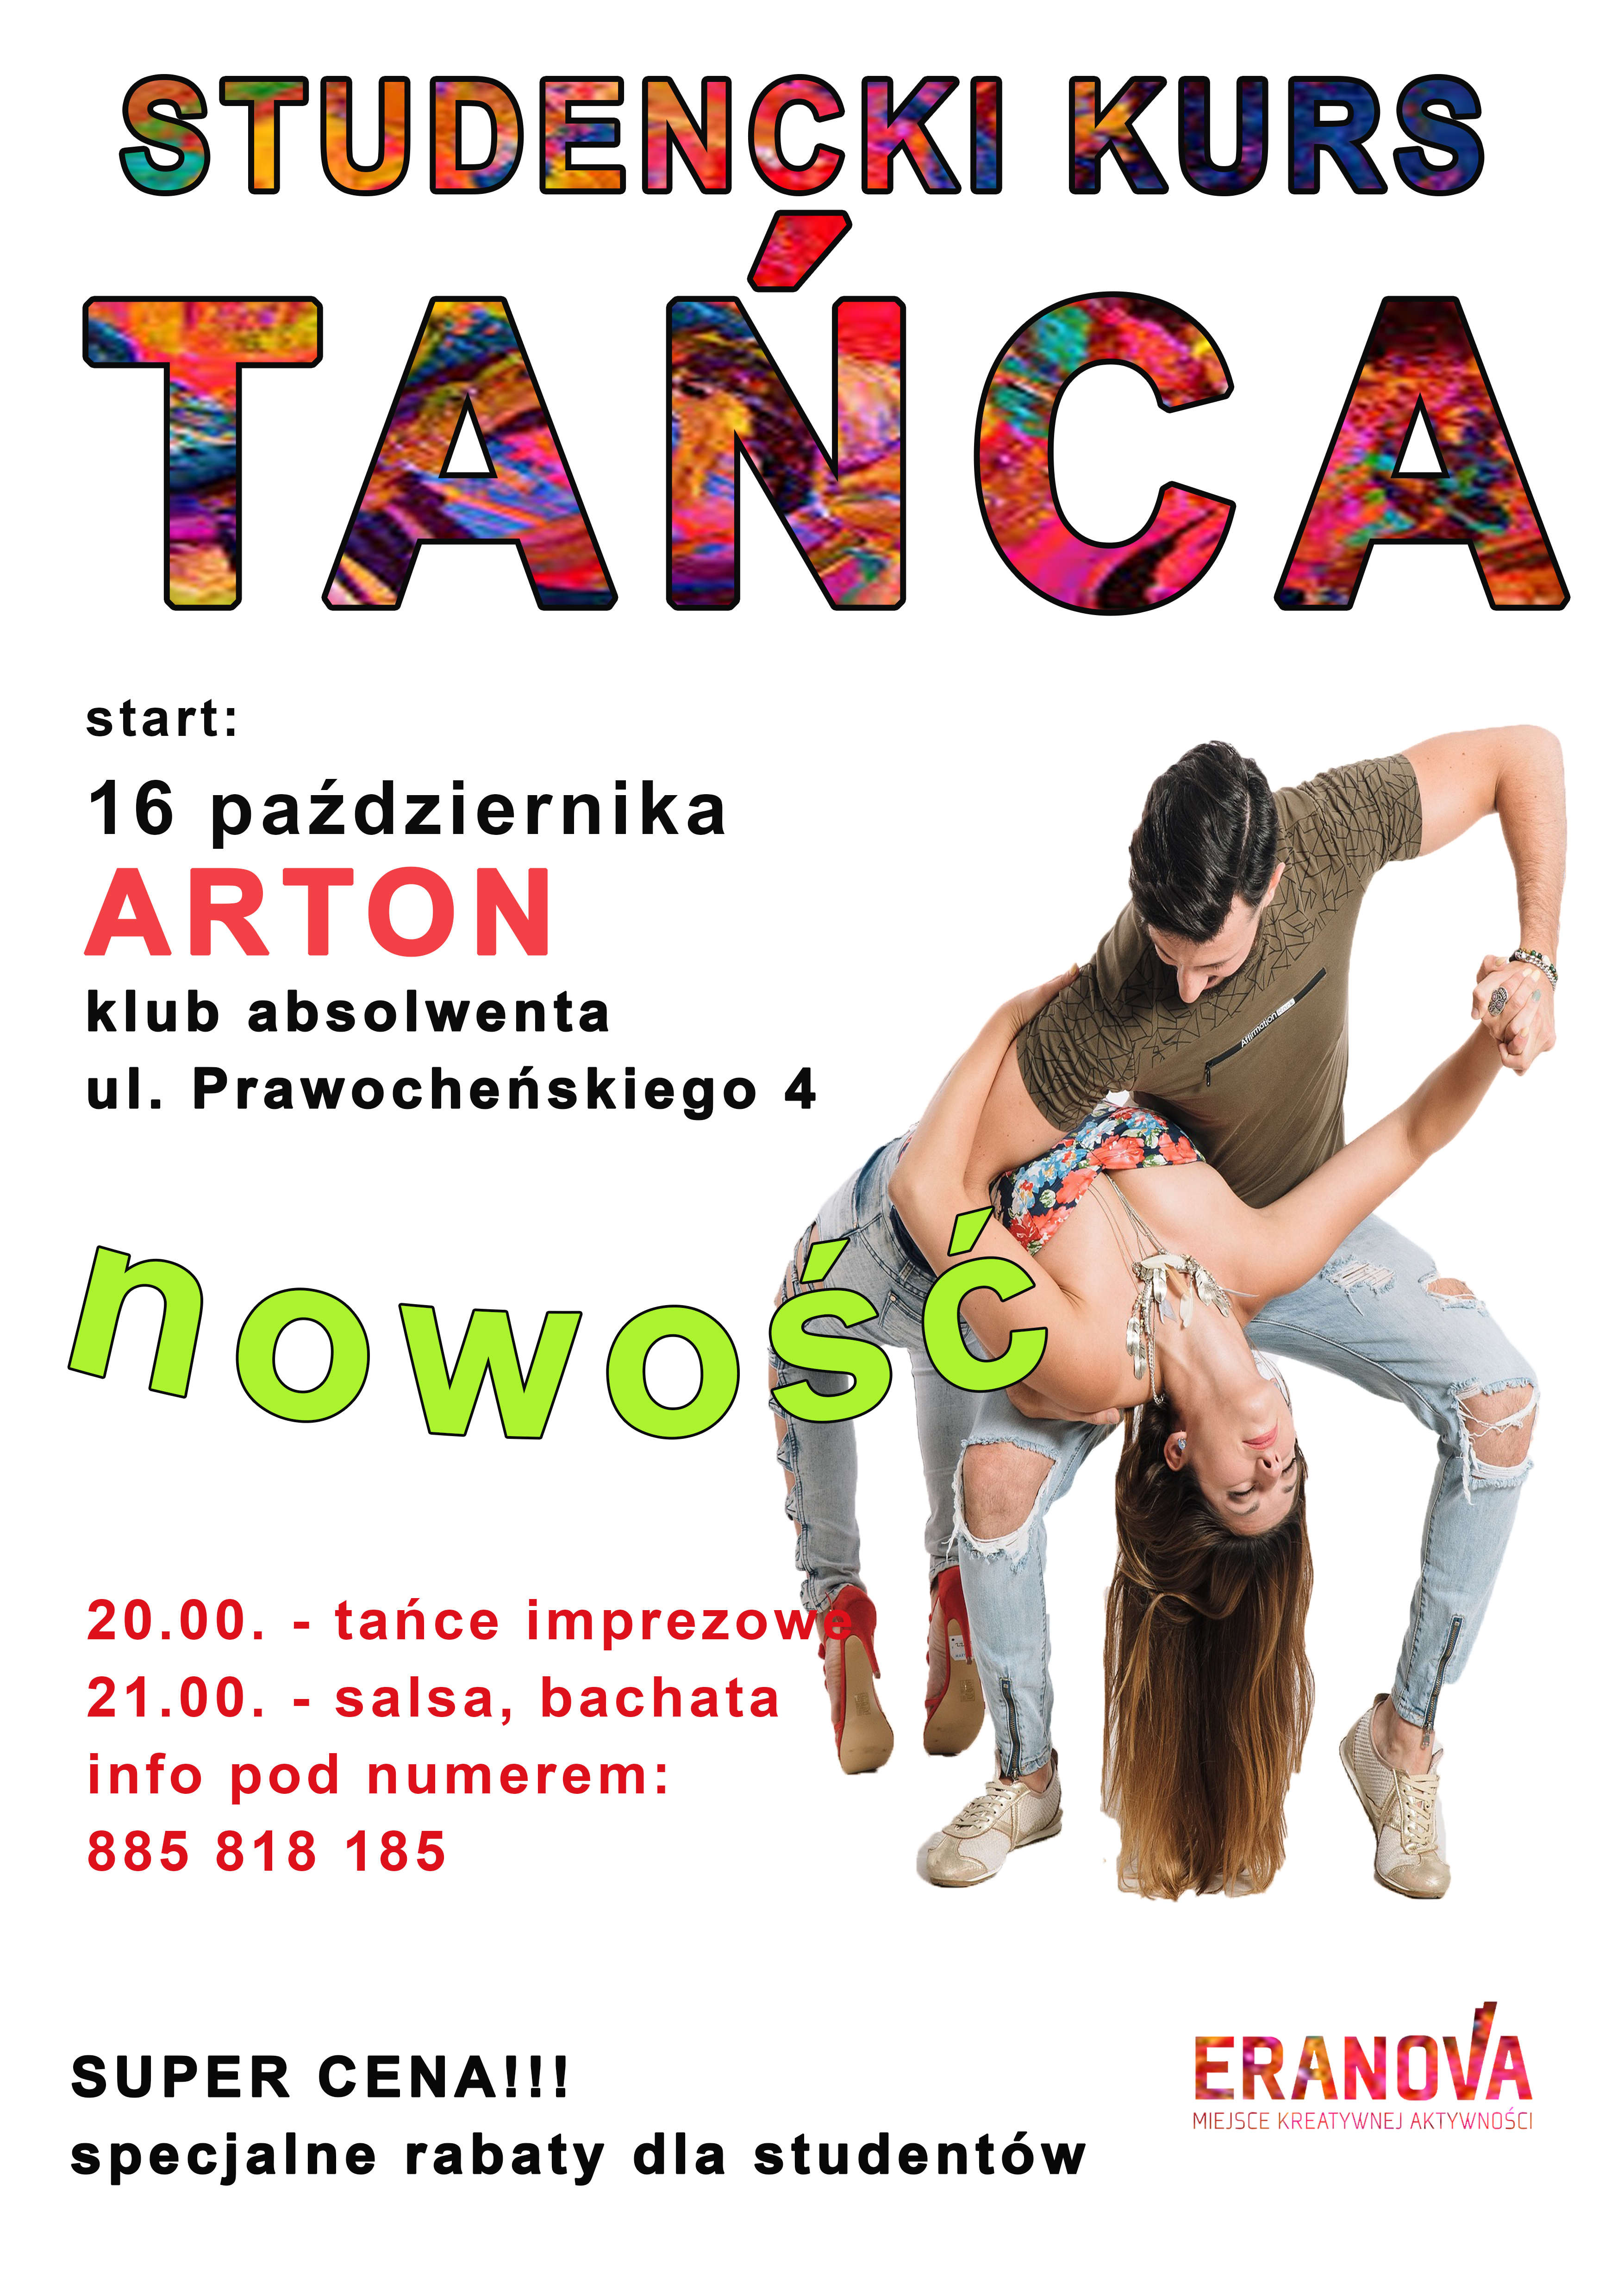 http://m.eranova.pl/2018/10/orig/studenci-psd-2763.jpg